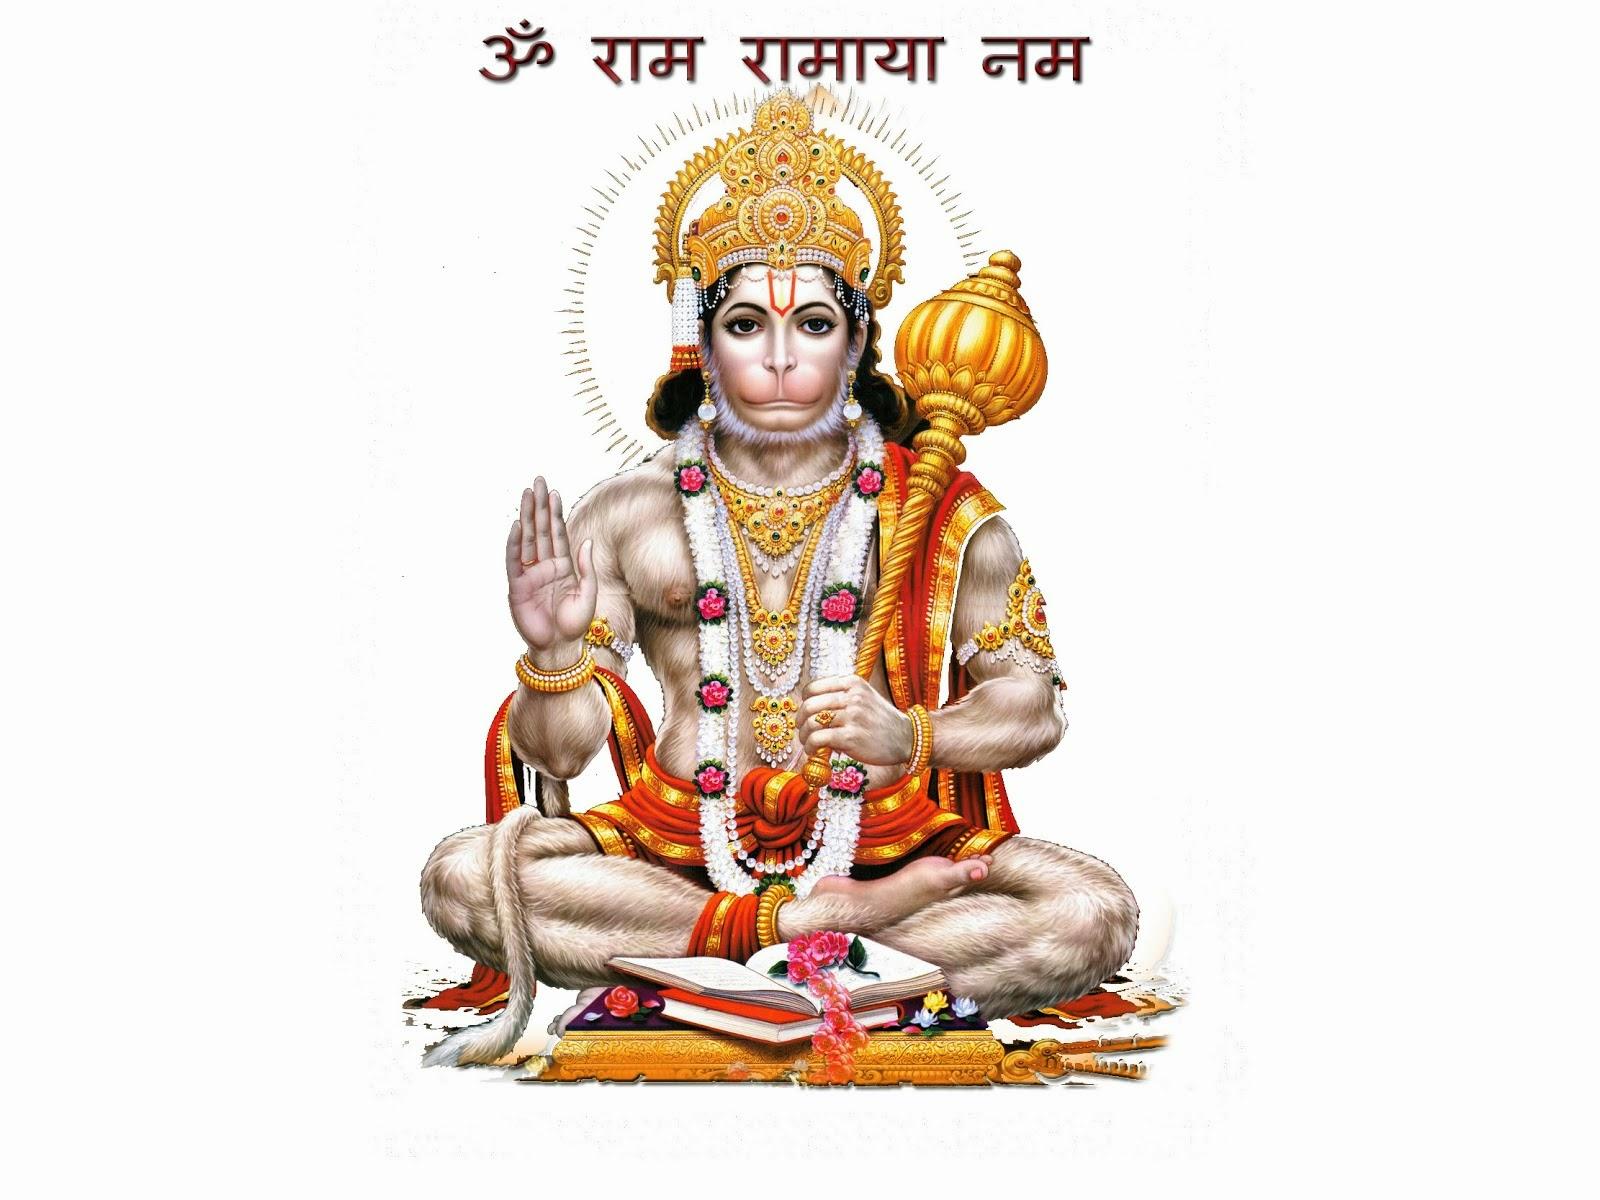 Hd wallpaper of hanuman - Free Hd Wallpapers Of Download Free Hd Wallpapers Download Hd Wallpapers Of Events Download Hanuman Ji Hd Images Of Hanumanji